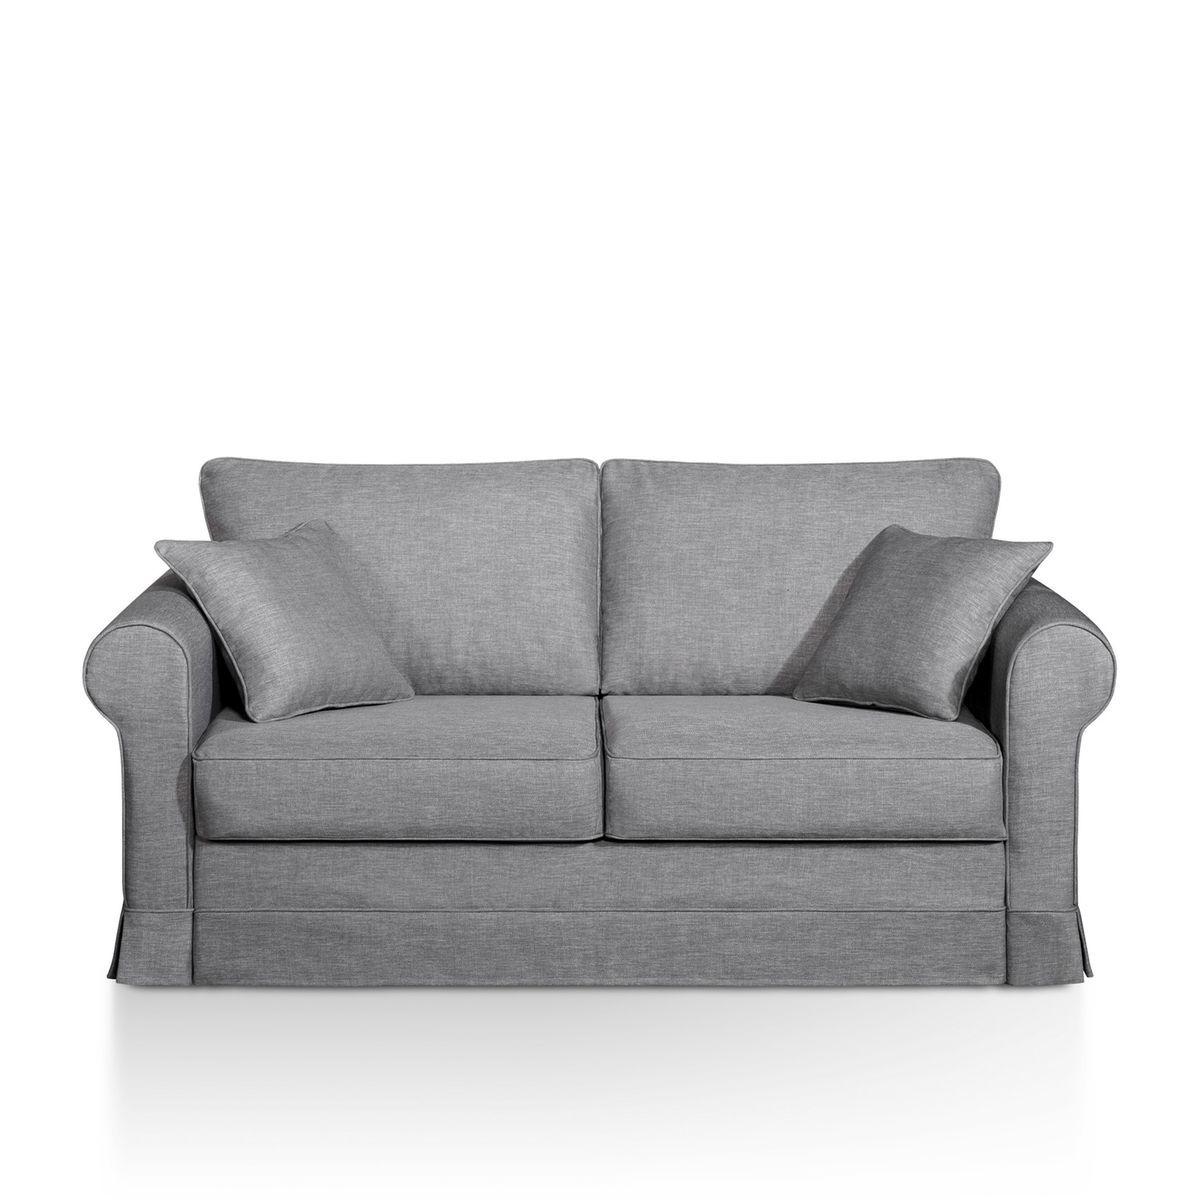 Canapé lit, couchage express, chiné, Yukata | Salon | Pinterest ...